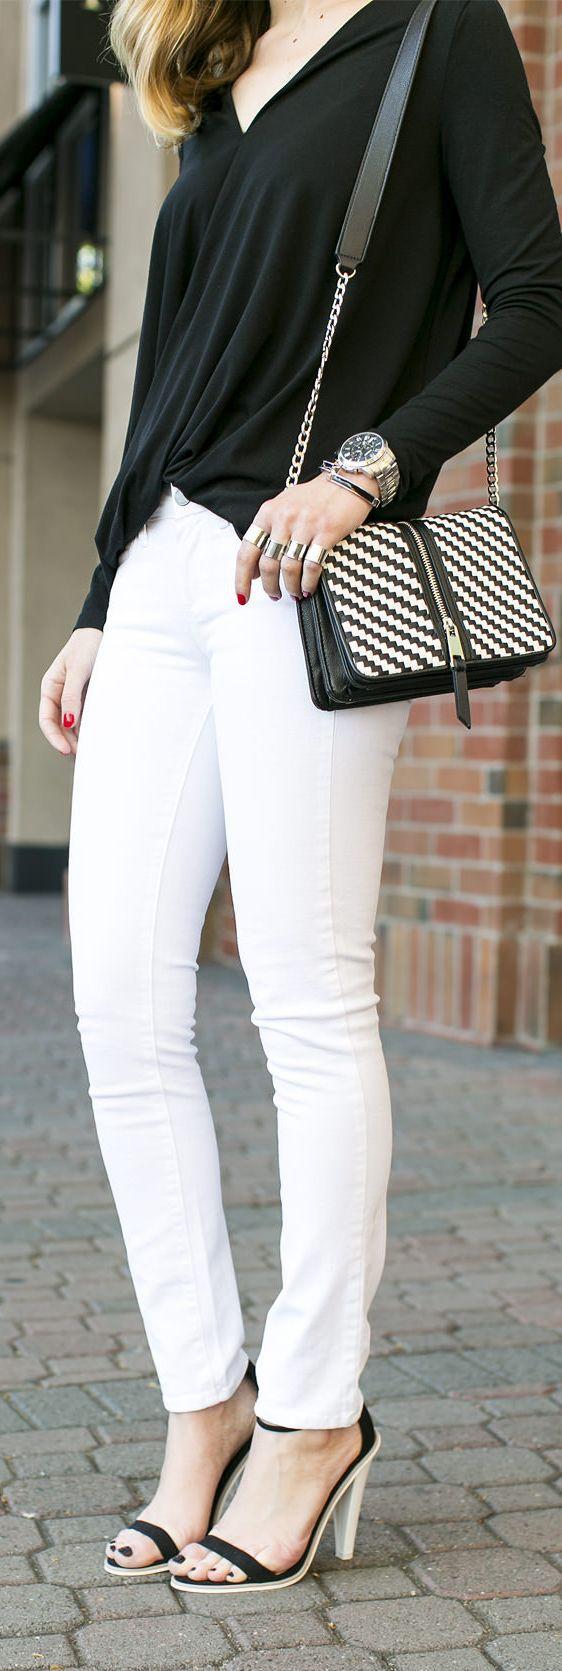 Paige Denim White Slim Ankle Grazer Jeans                                                                             Source